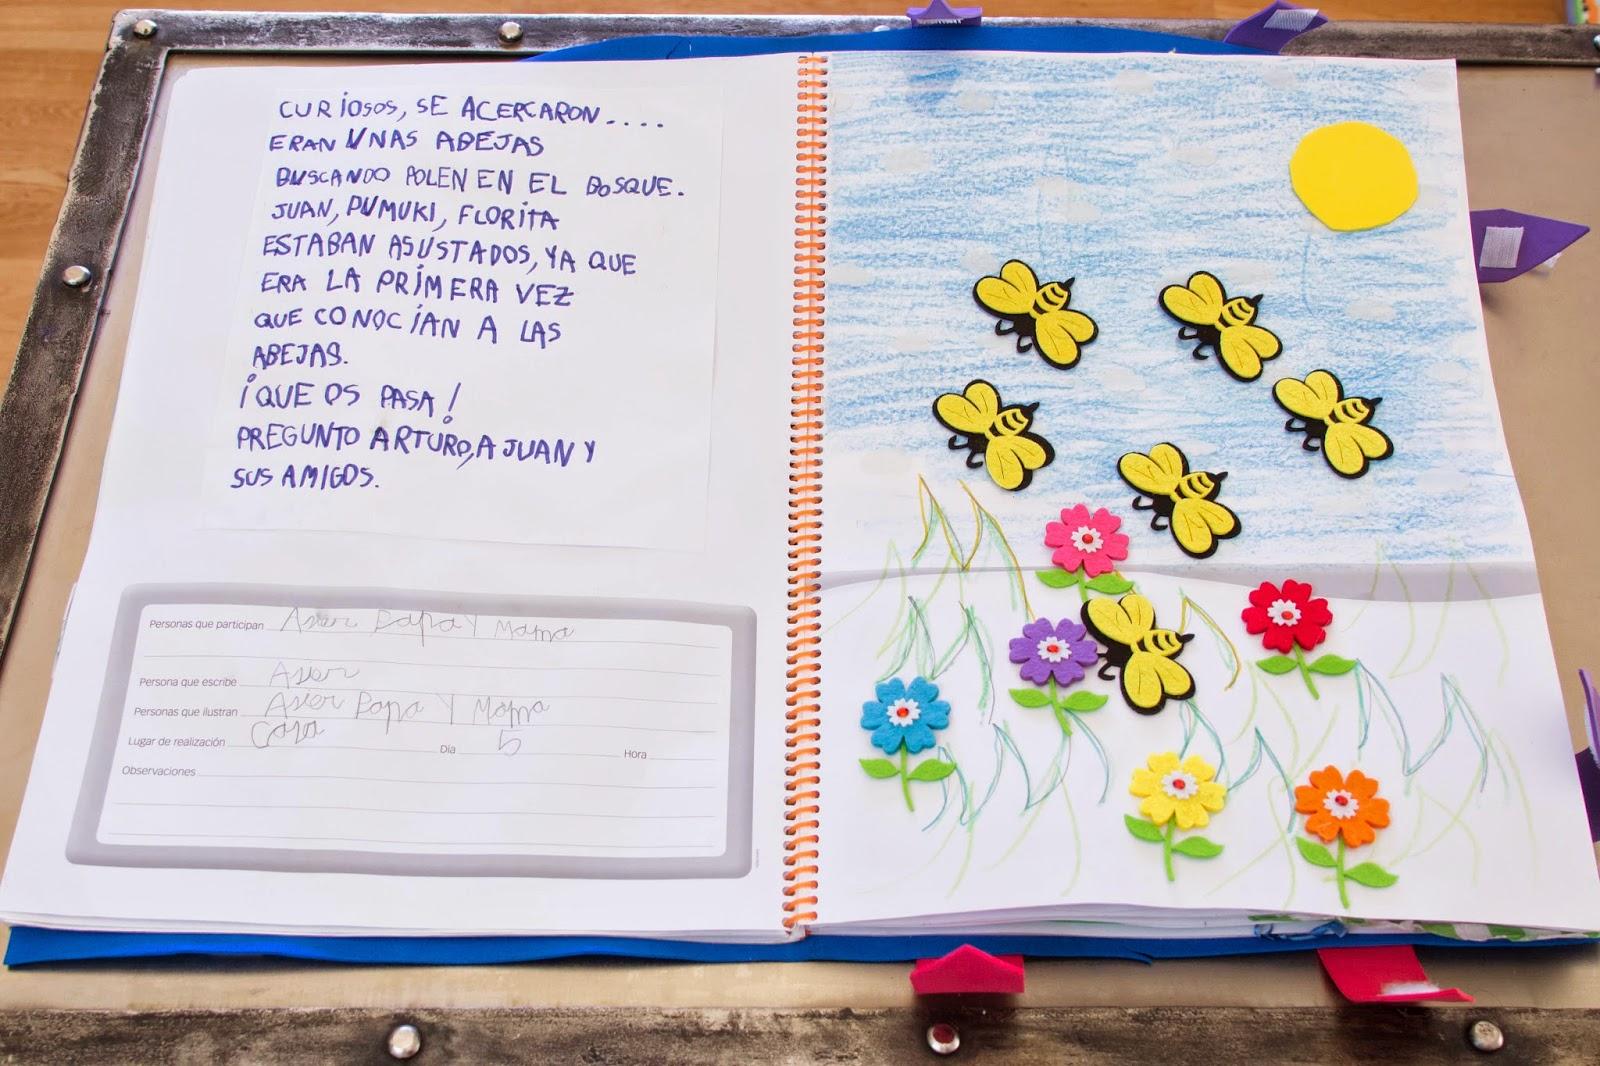 Blog de patri educaci n infantil nuestro libro viajero - Ideas libro viajero infantil ...